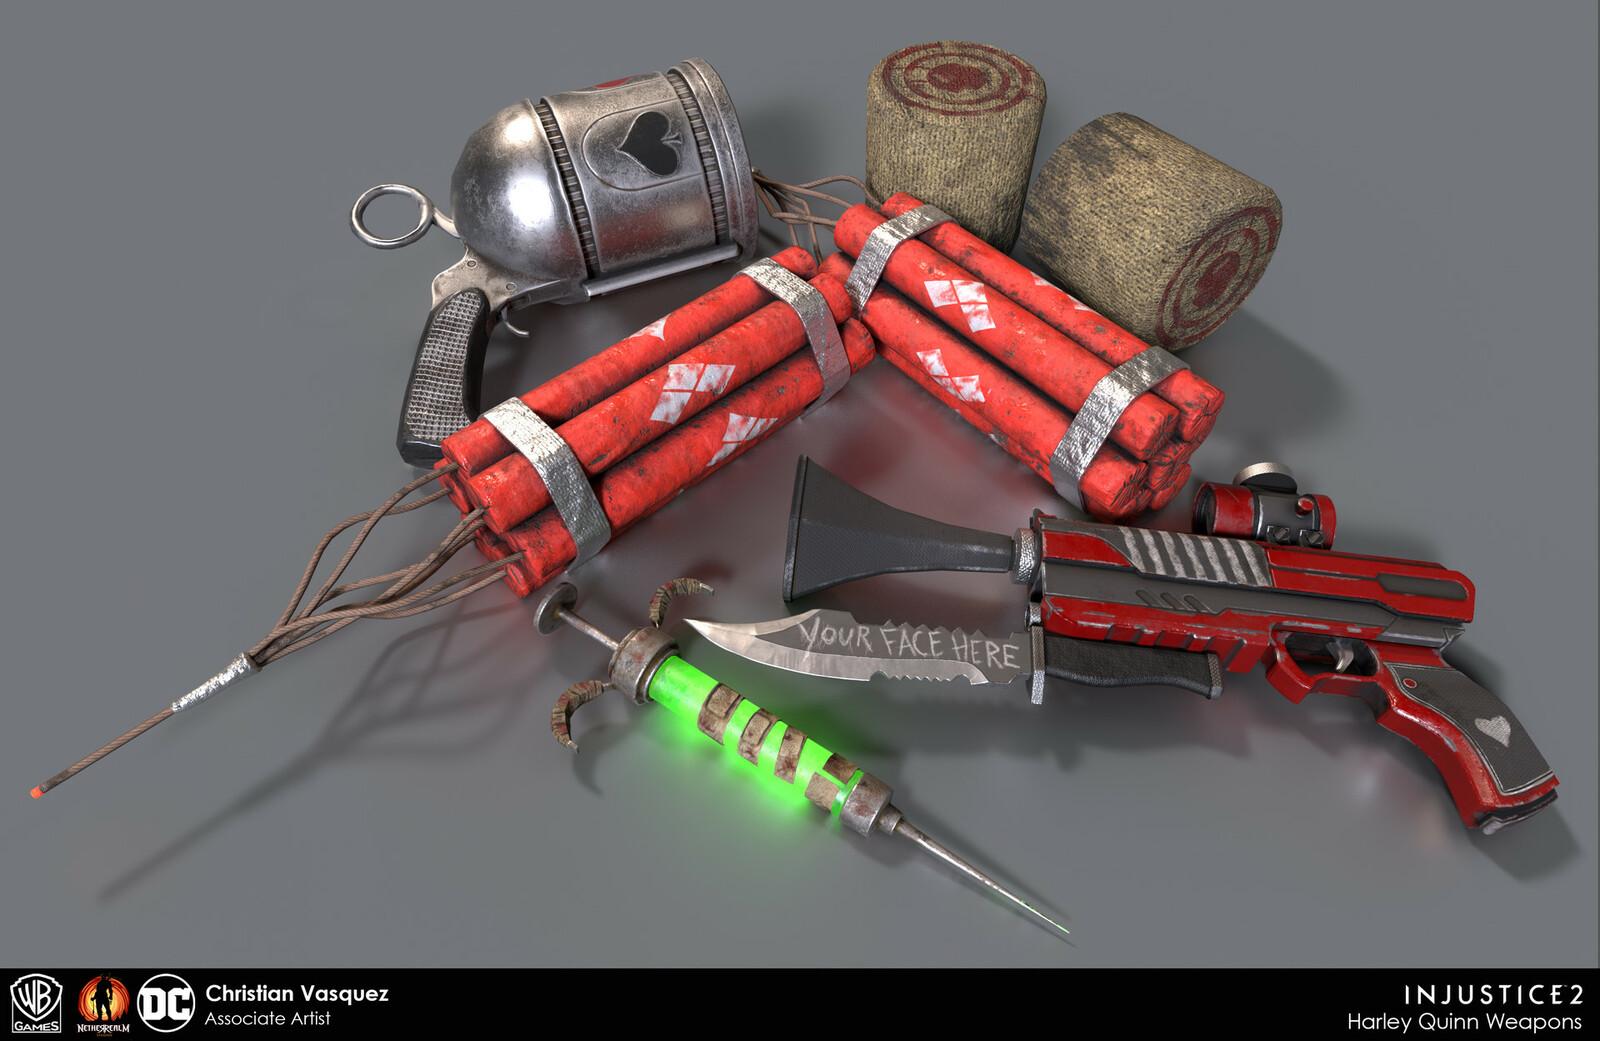 Harley Quinn's arsenal